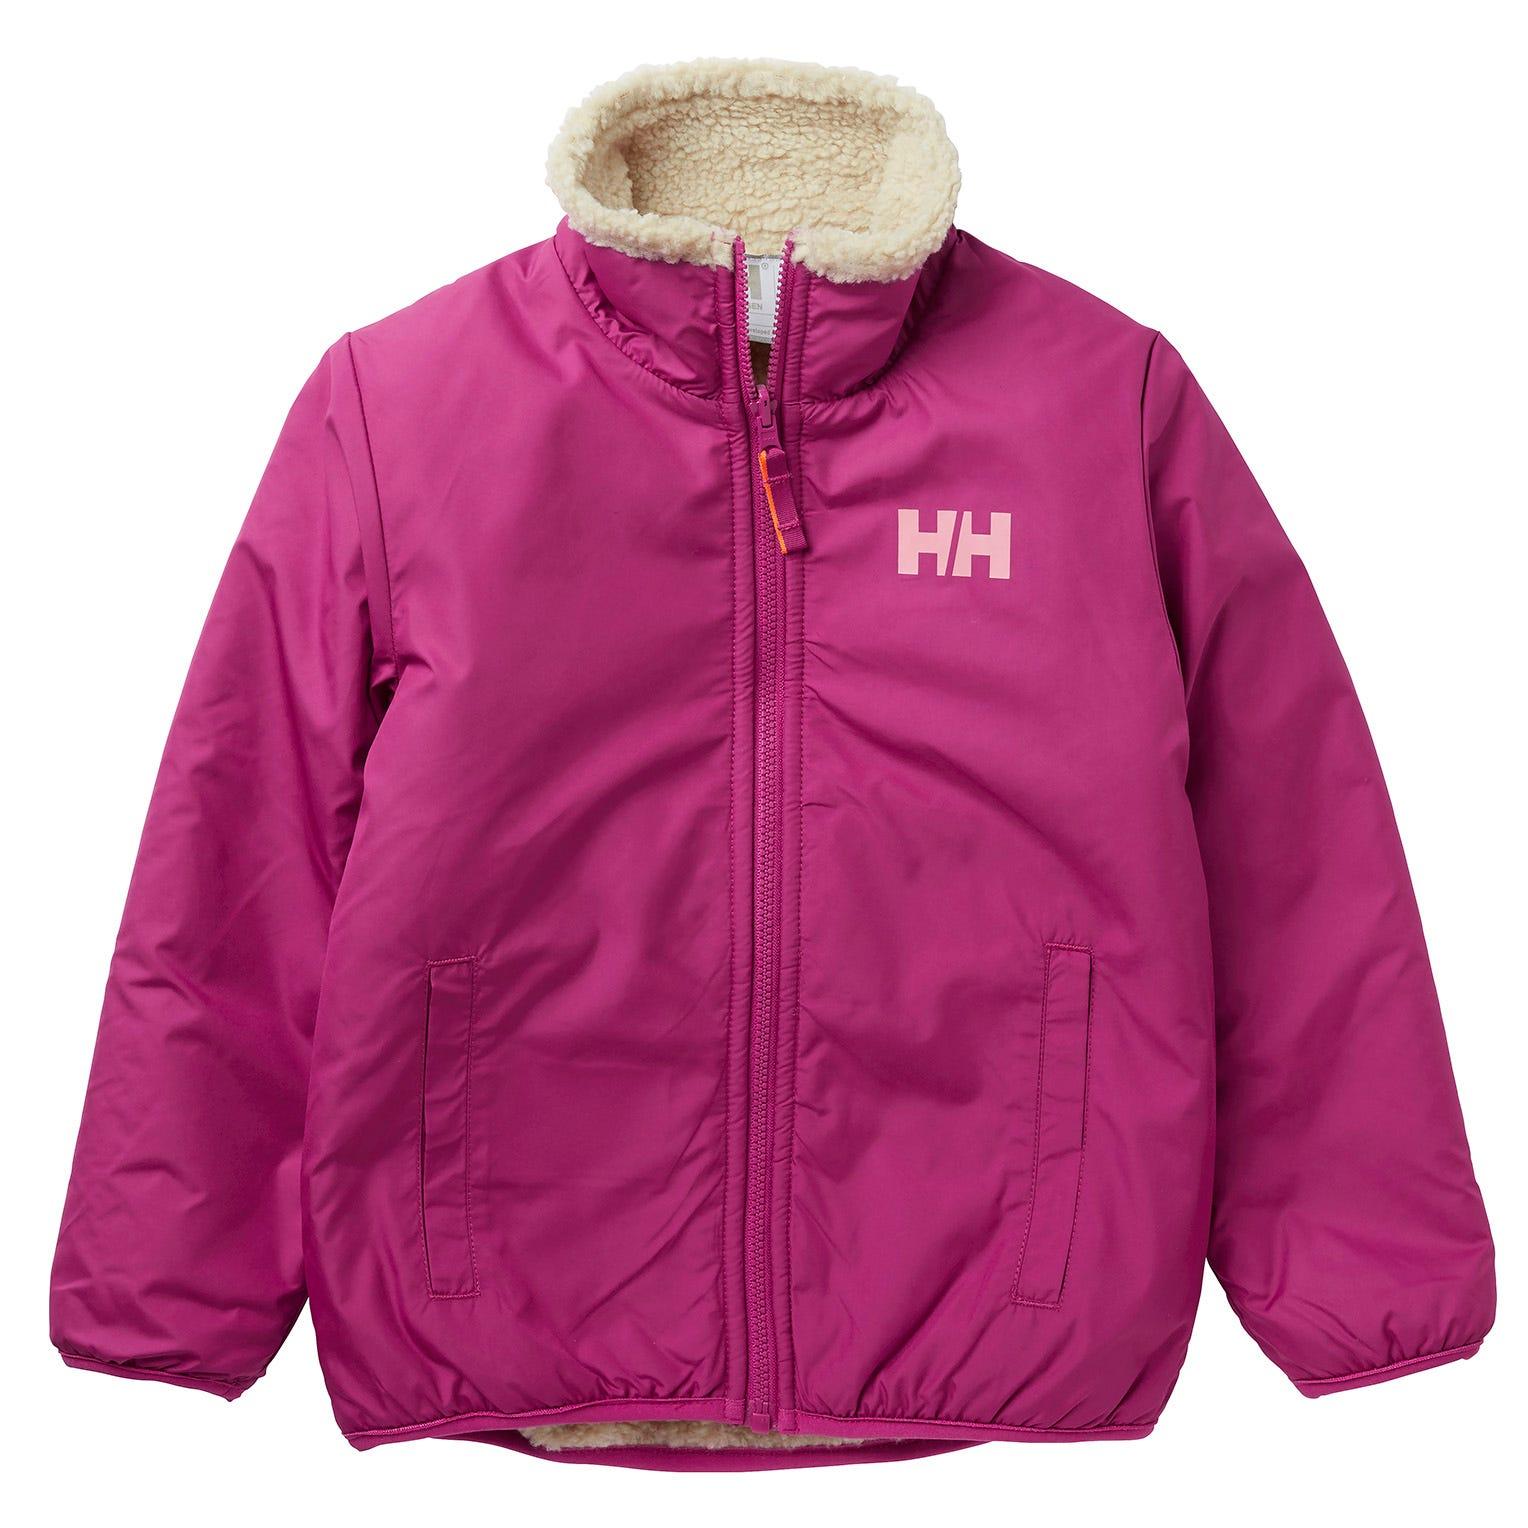 Helly Hansen Kids Reversible Pile Jacket Parka Yellow 128/8